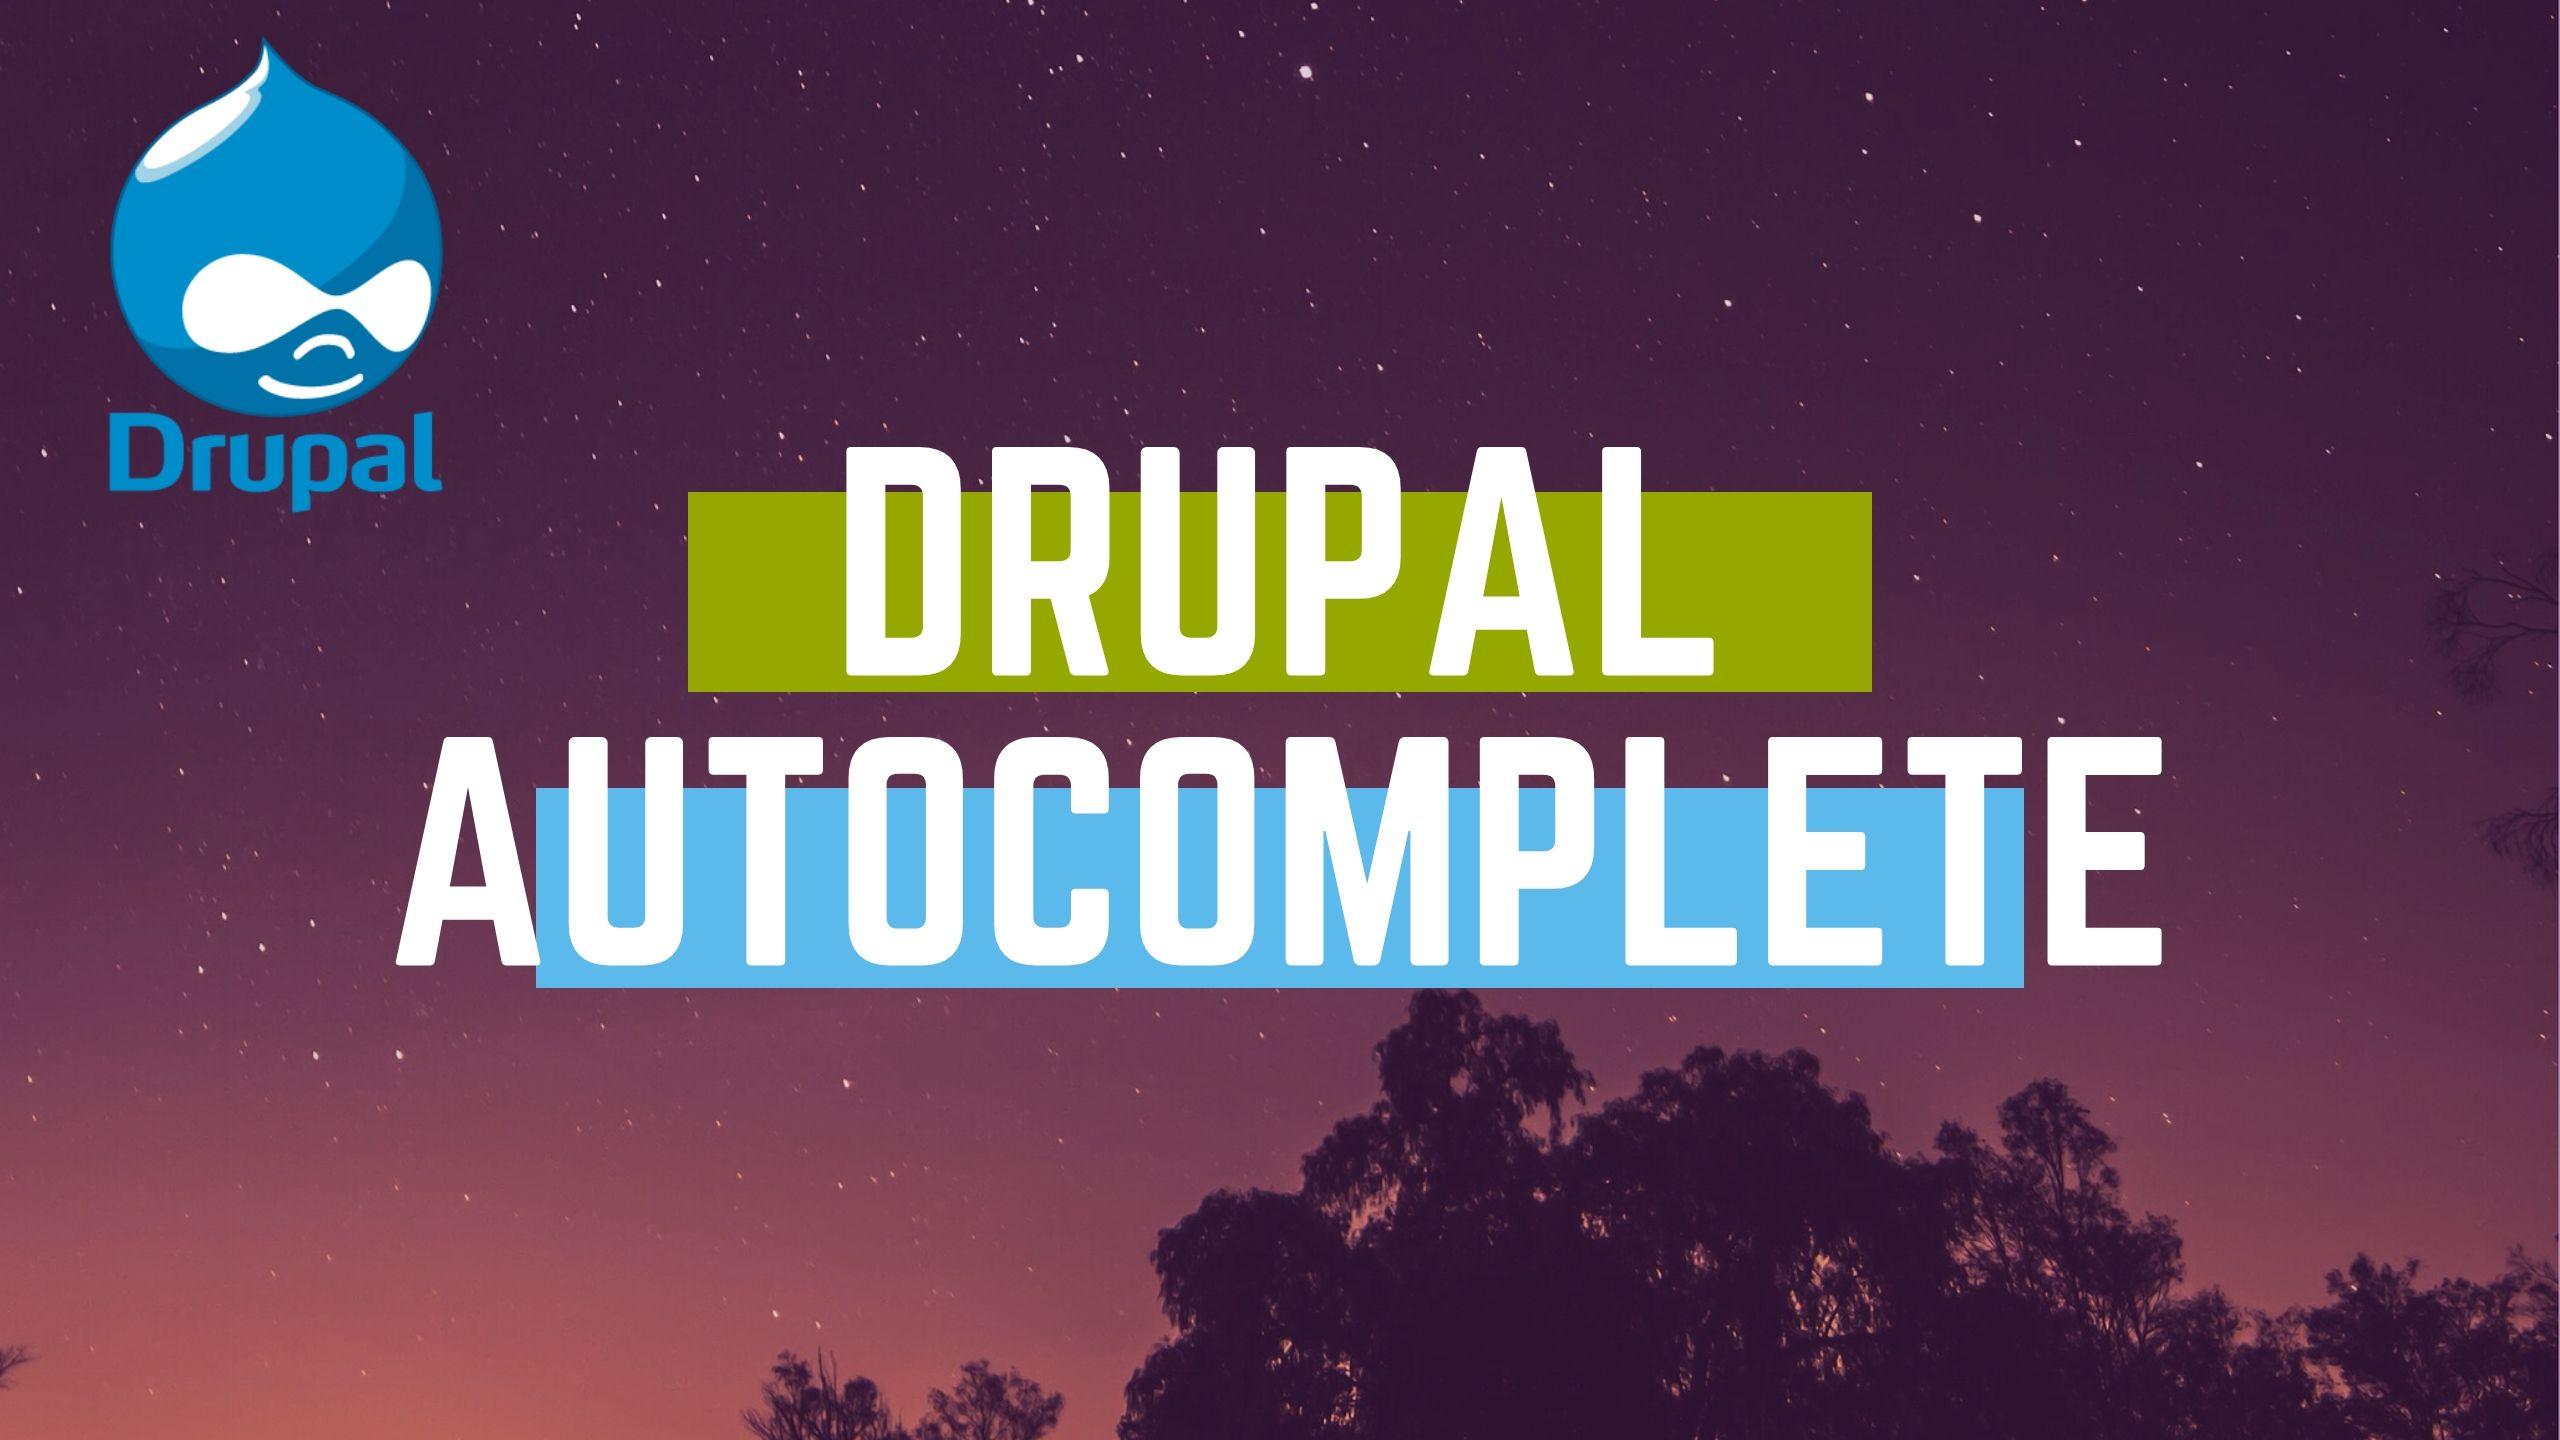 Drupal autocomplete